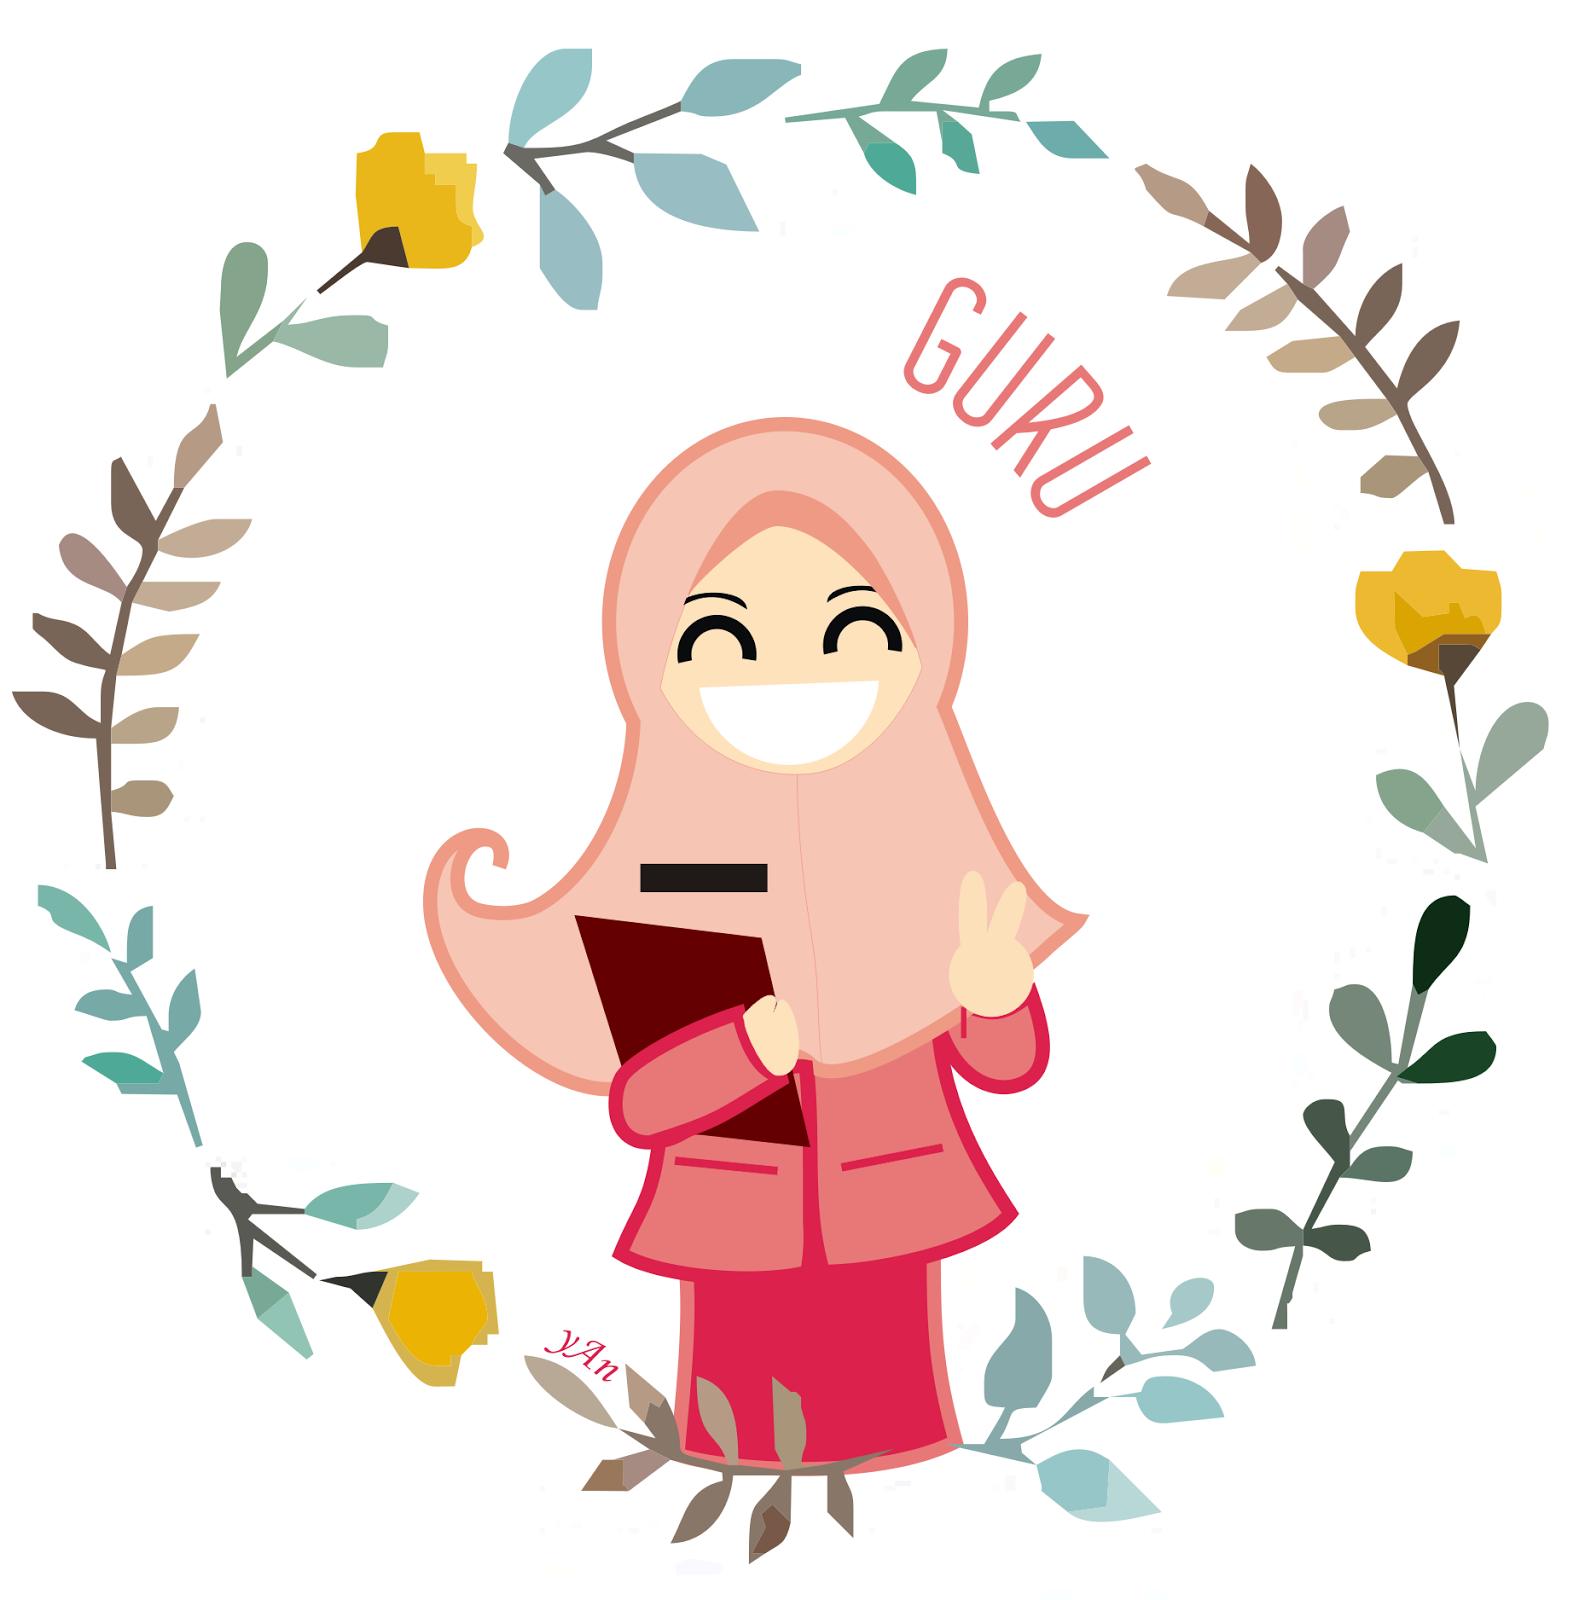 Gambar Mewarnai Gambar Profesi Guru Kartun Muslimah Di Rebanas Kartun Poster Desain Grafis Animasi